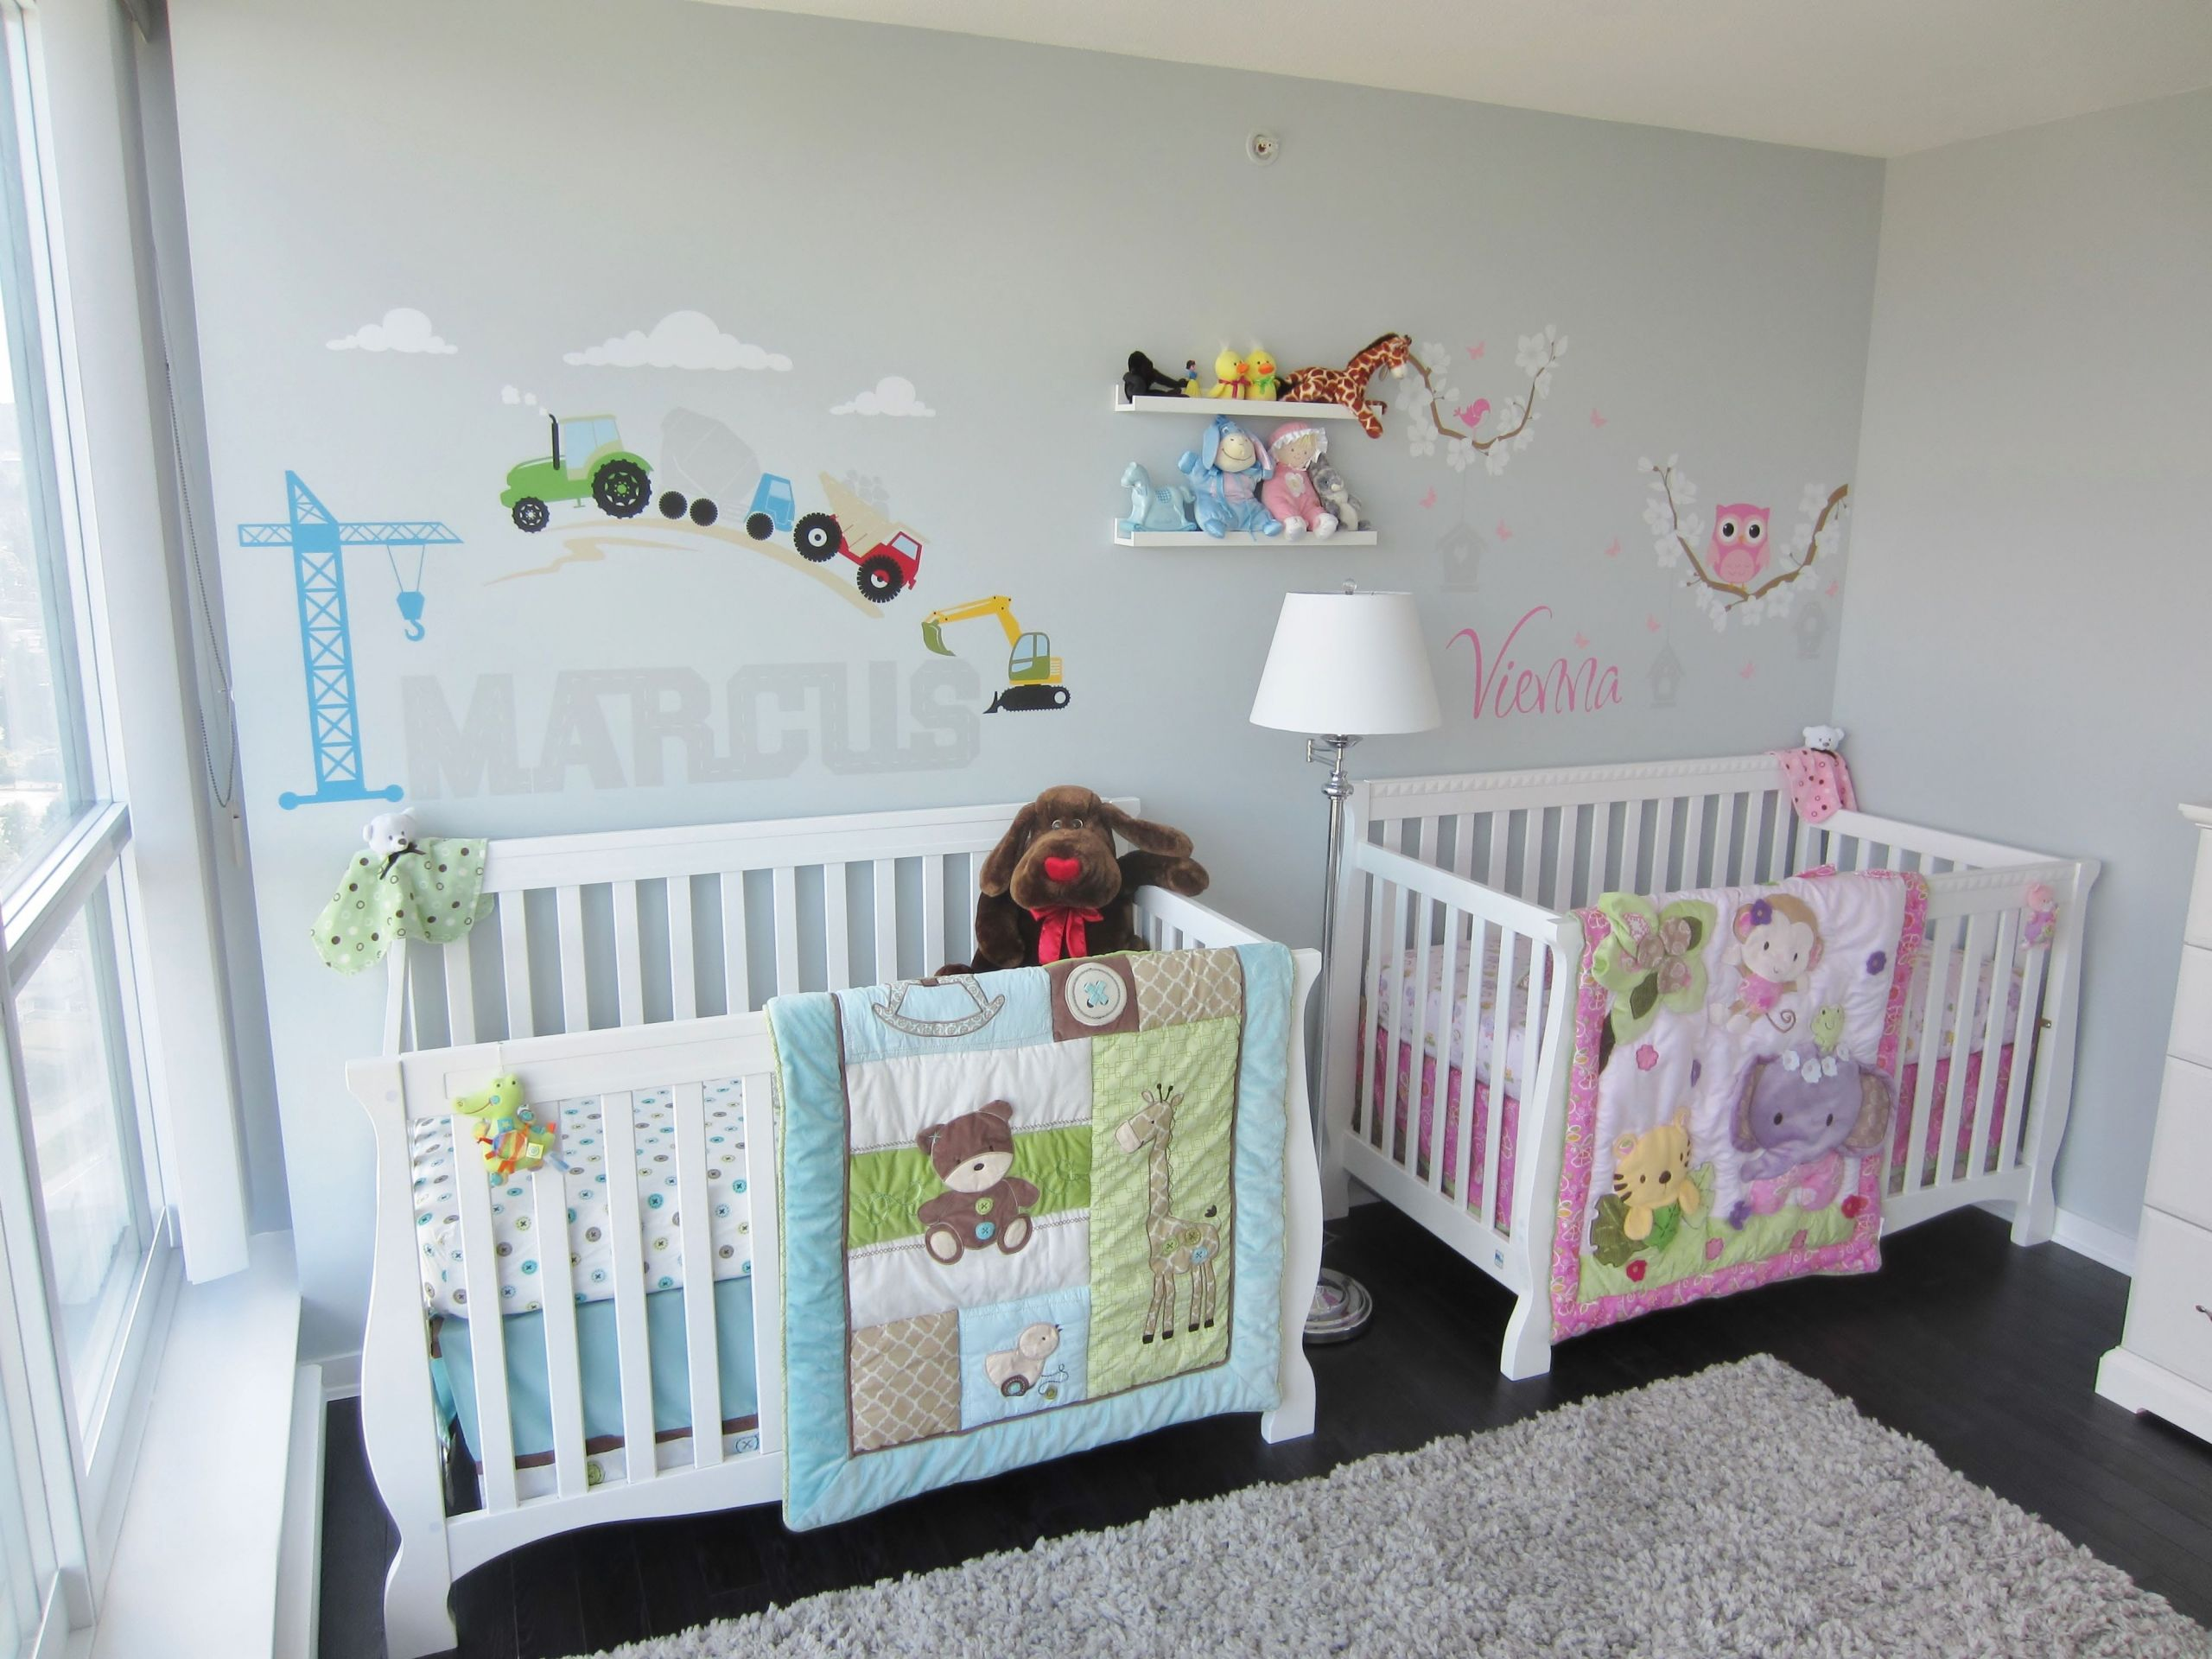 Twins Baby Room Decorating Ideas  Twins Nursery boy & girl